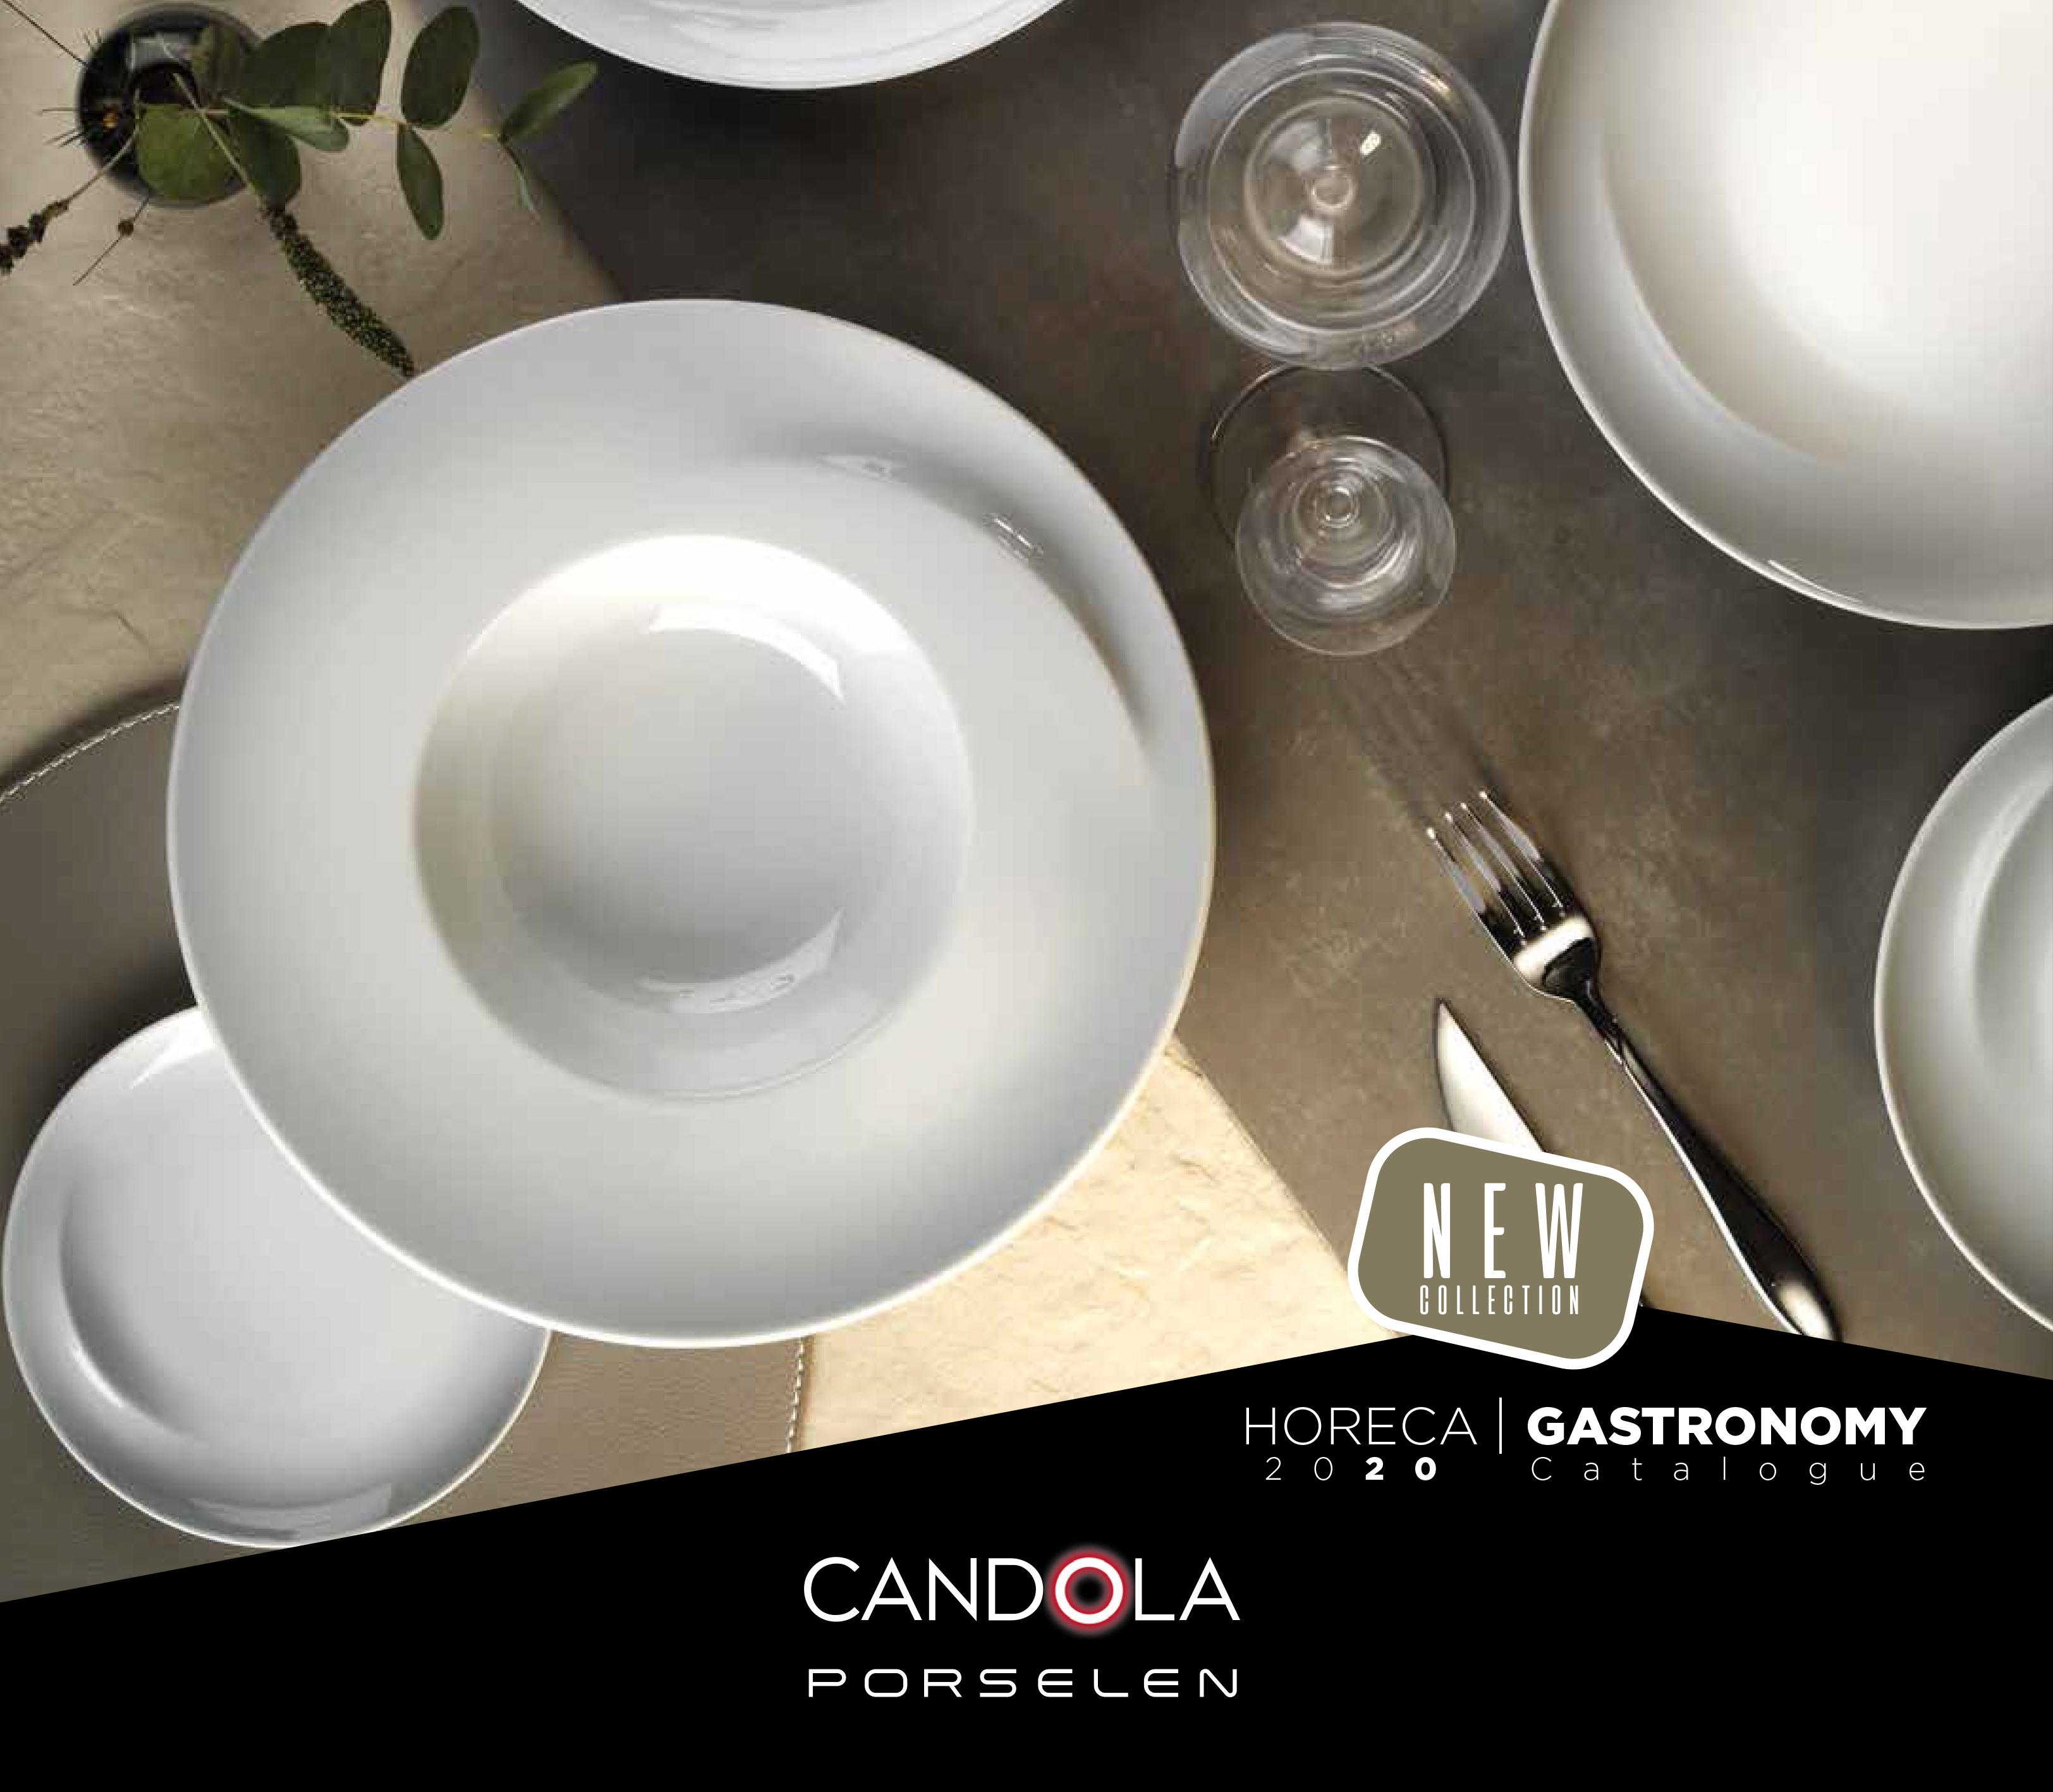 CANDOLA_Horeca_Tavola_Cafe_shop_katalog_2020_titulka